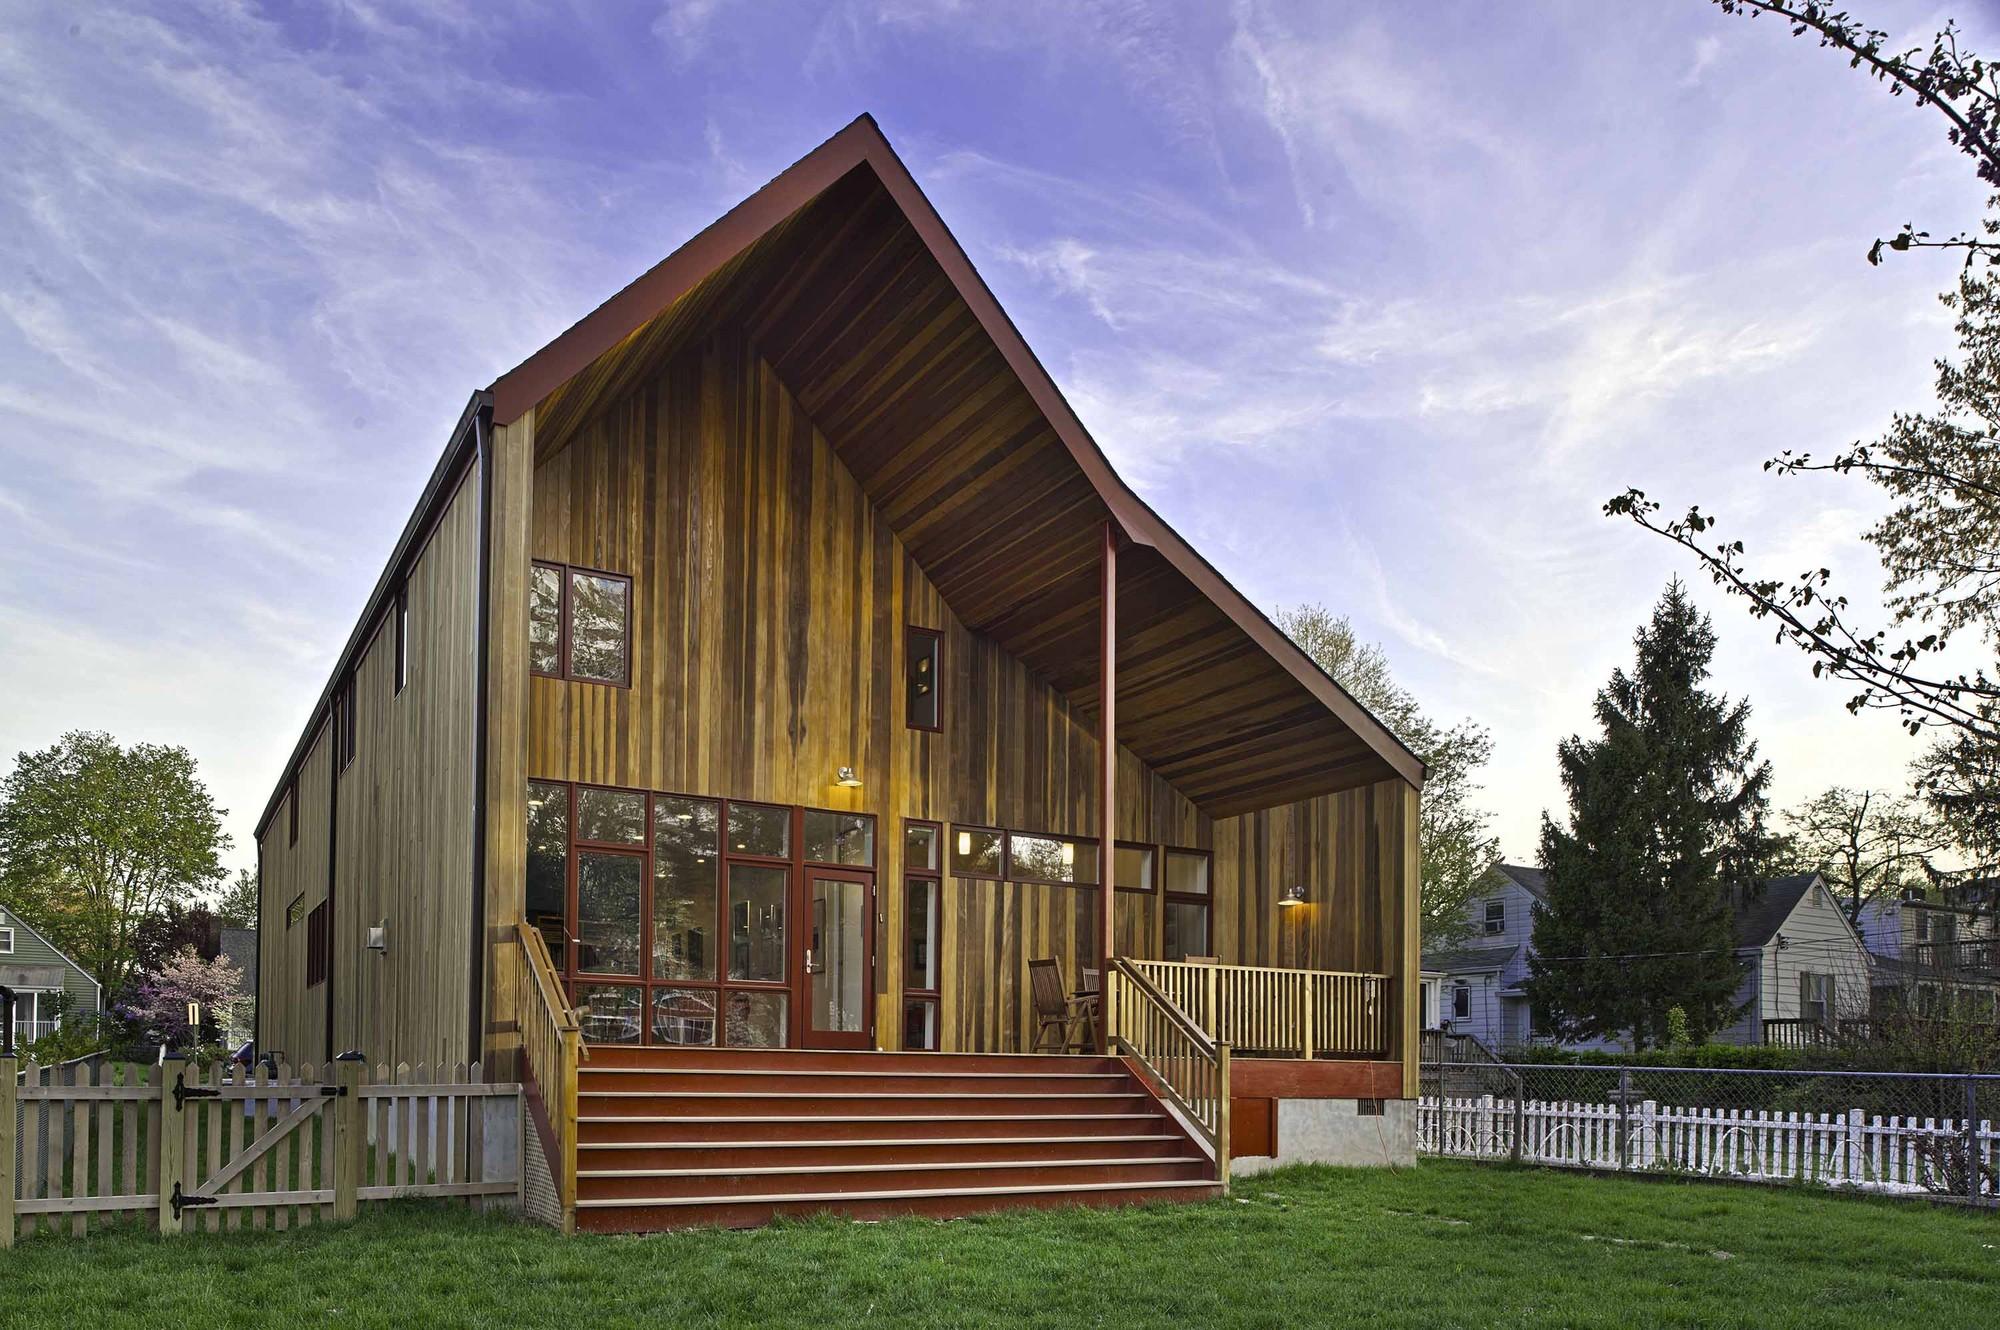 Empty Nester Residence / Studio Twenty Seven Architecture, © Hoachlander Davis Photography / Anice Hoachlander